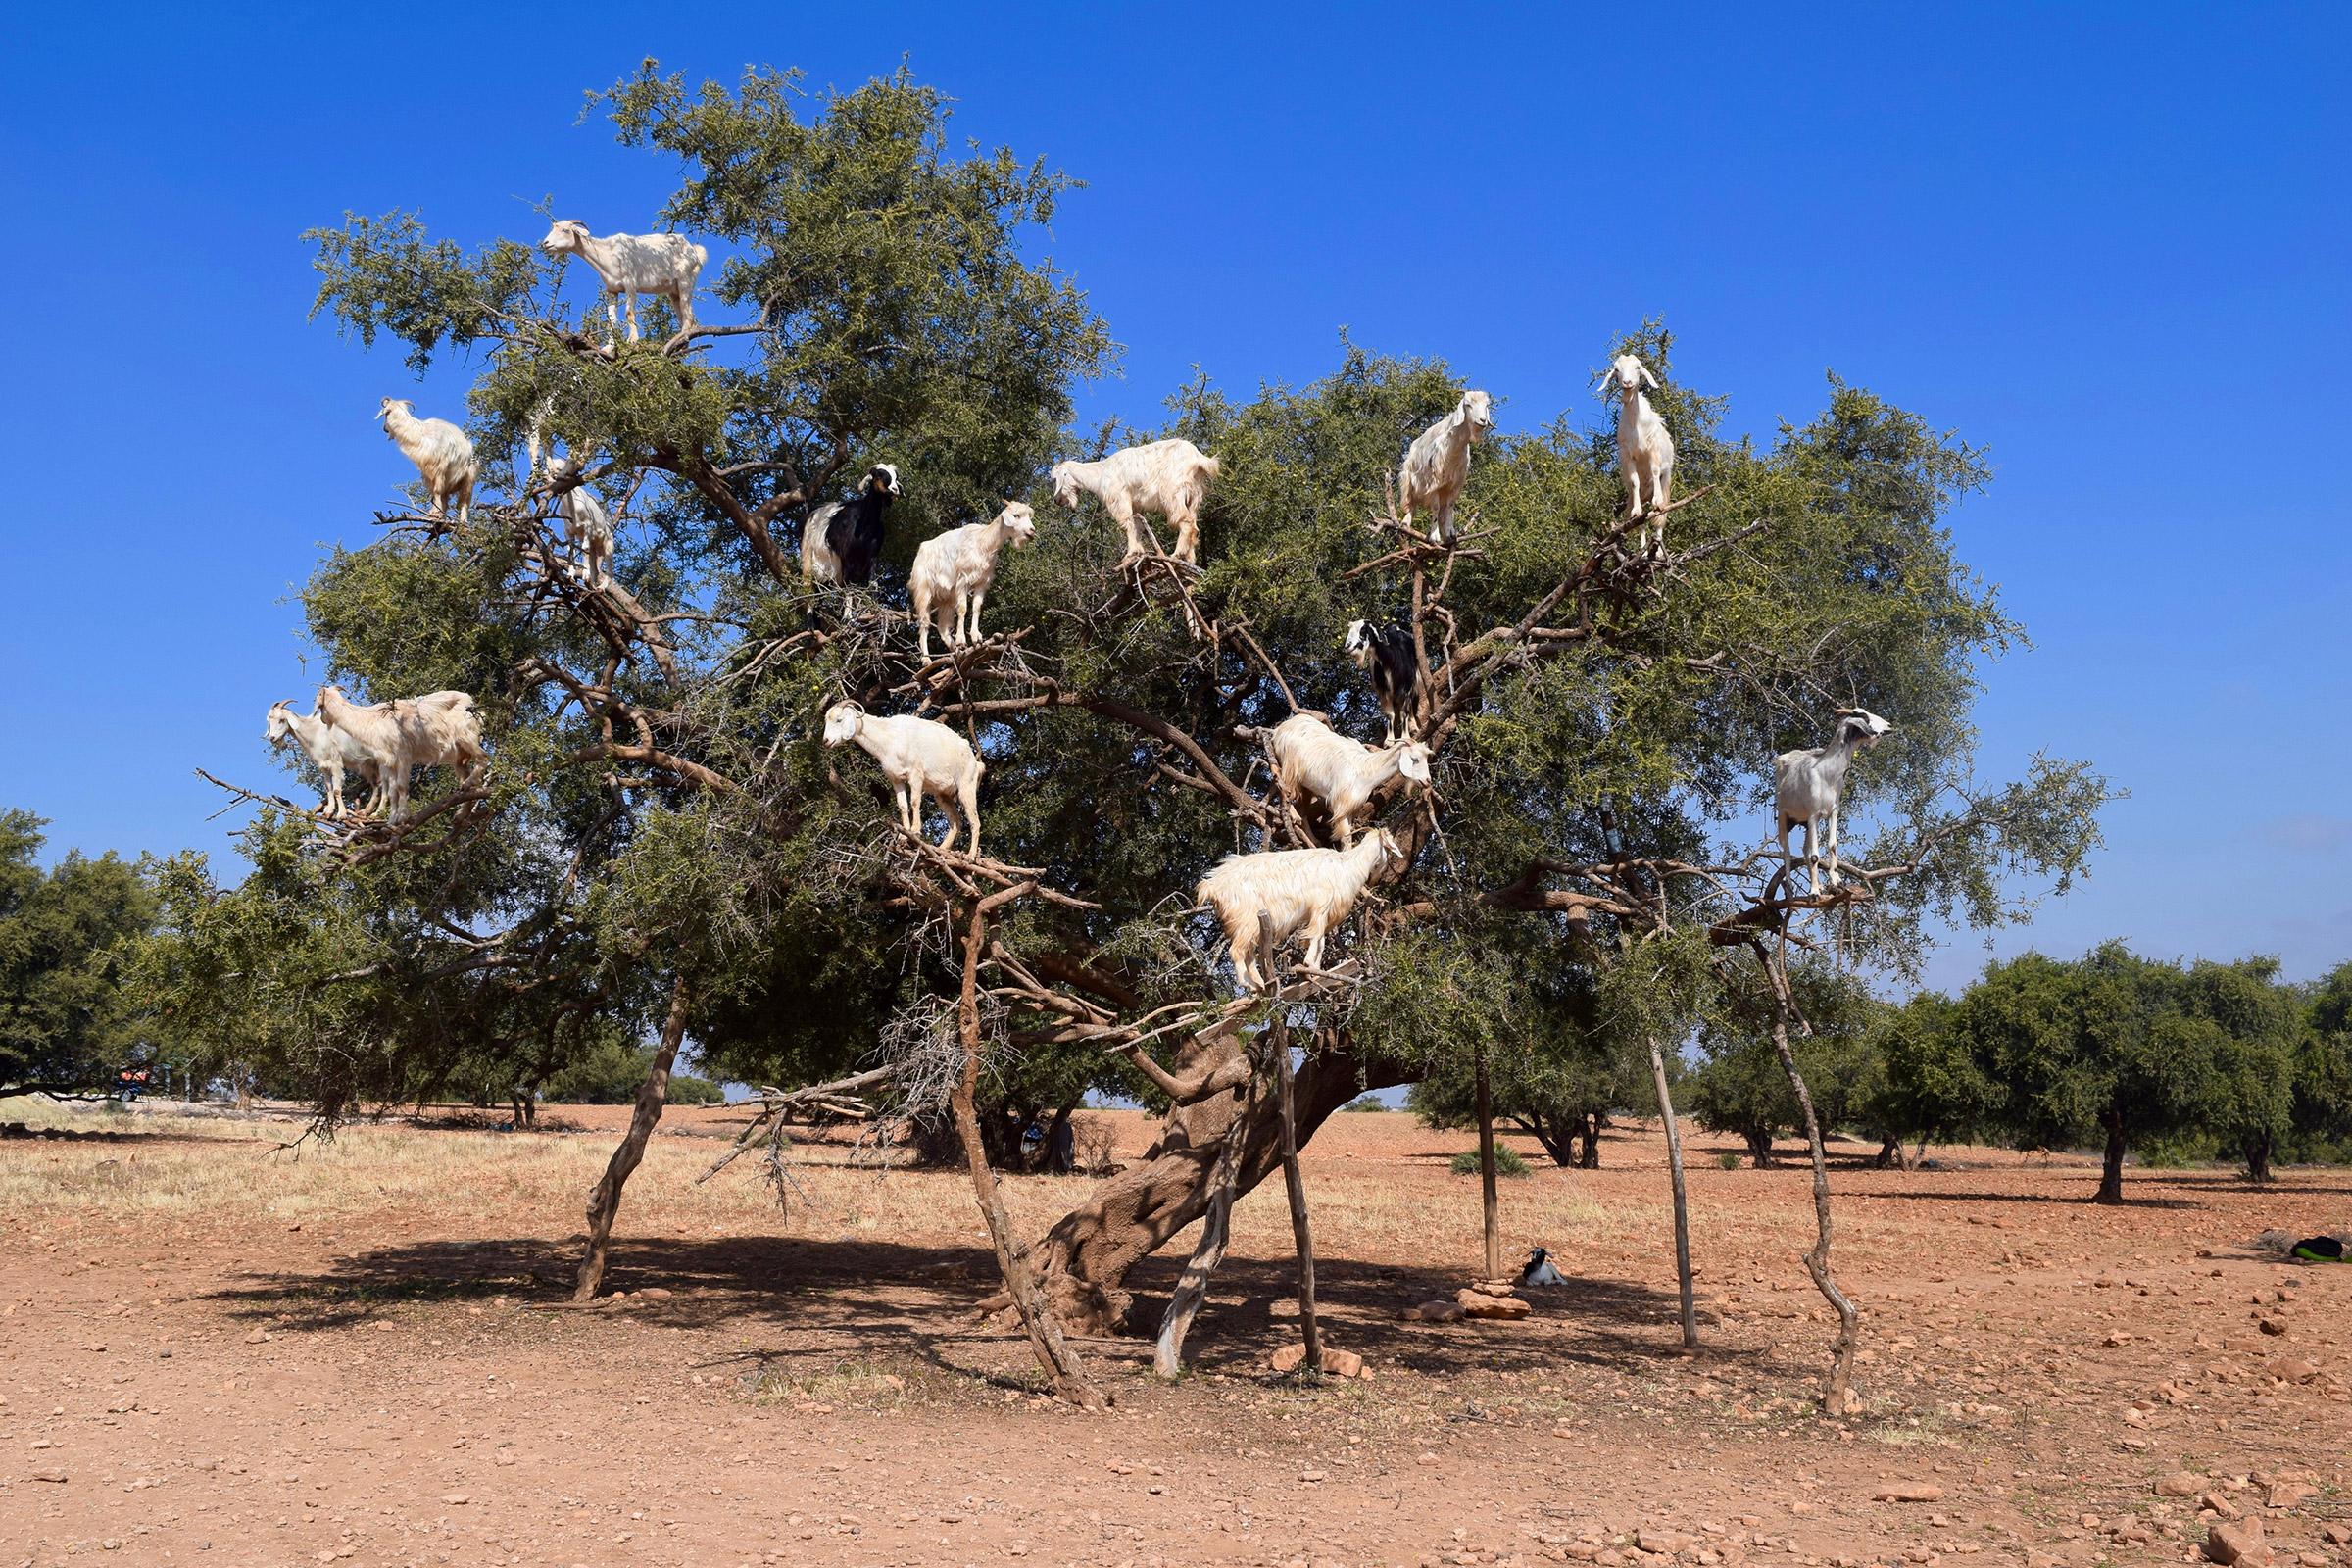 Morocco Goats In An Argan Tree